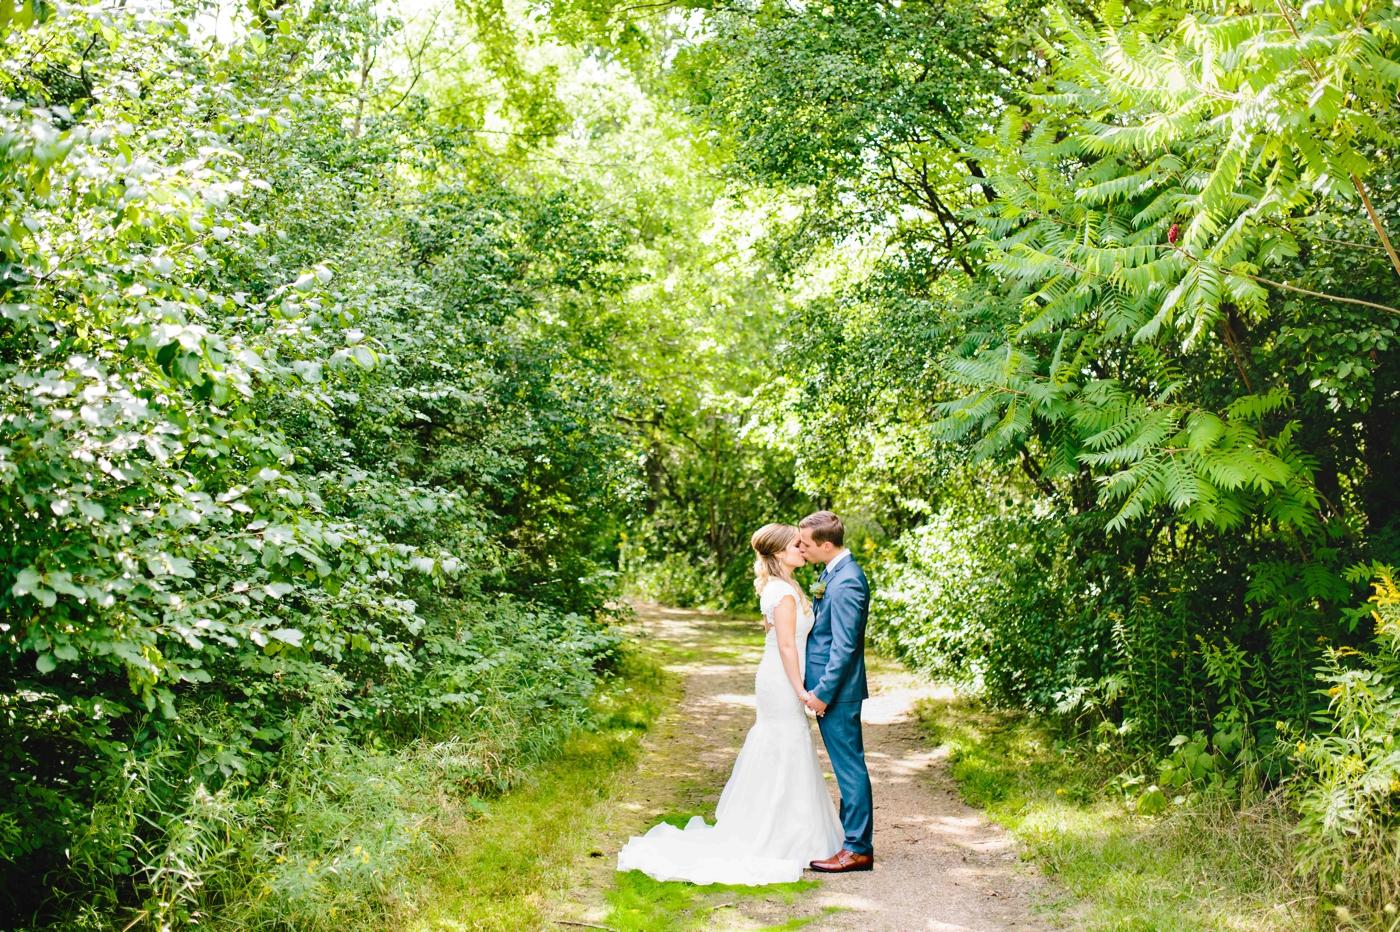 chicago-fine-art-wedding-photography-chiapetta18